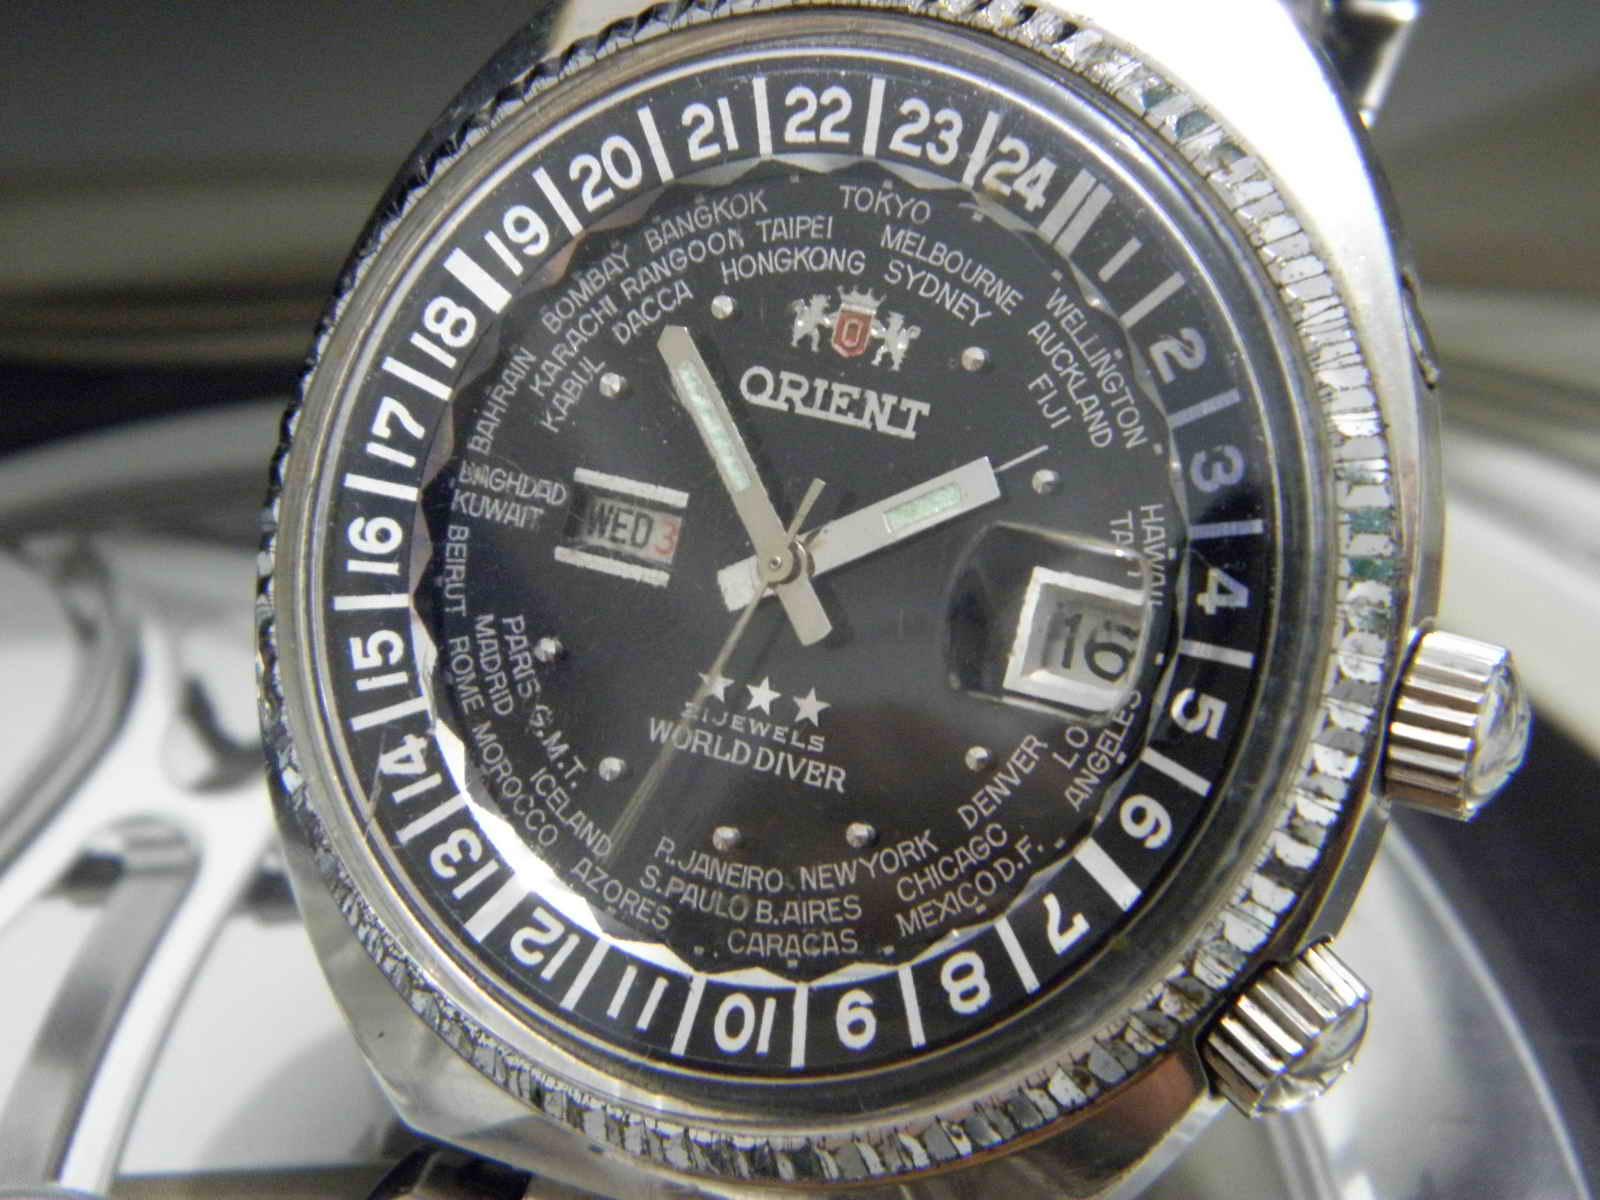 Orient worlddiver automatic Movement automatic 21 jewels japan made Dia 46 mm w c Dial hitam masih mulus kombinasi tulisan dan index silver nikel